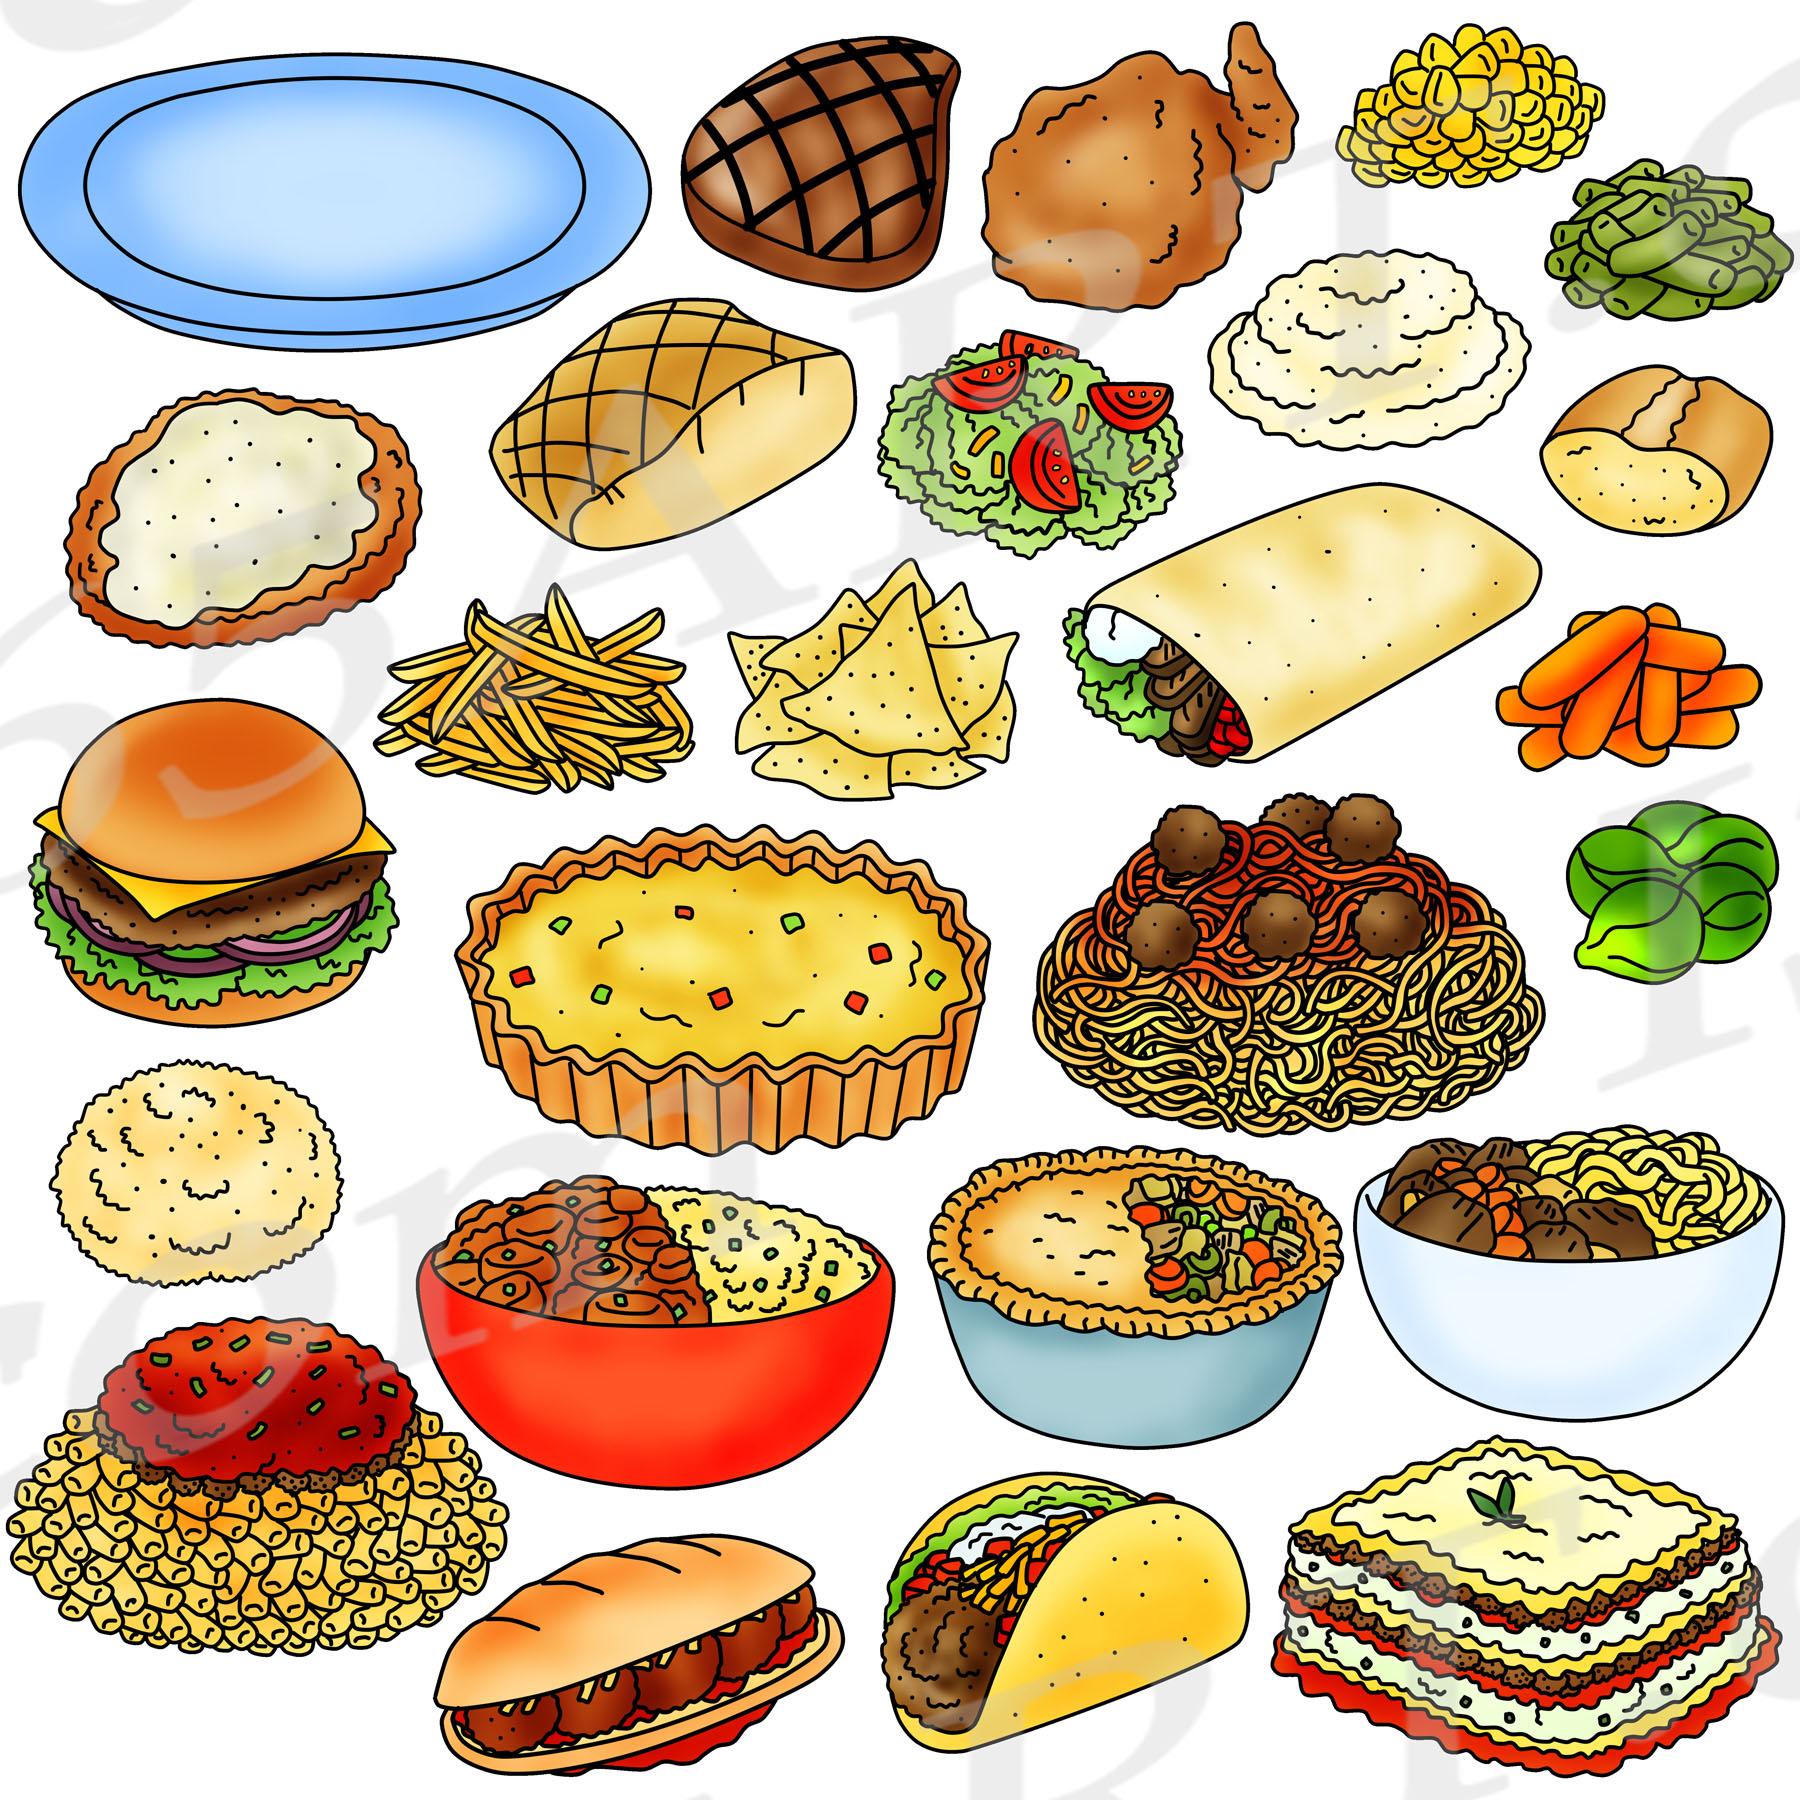 Food clipart dinner. Food clipart dinner. Foods meals download